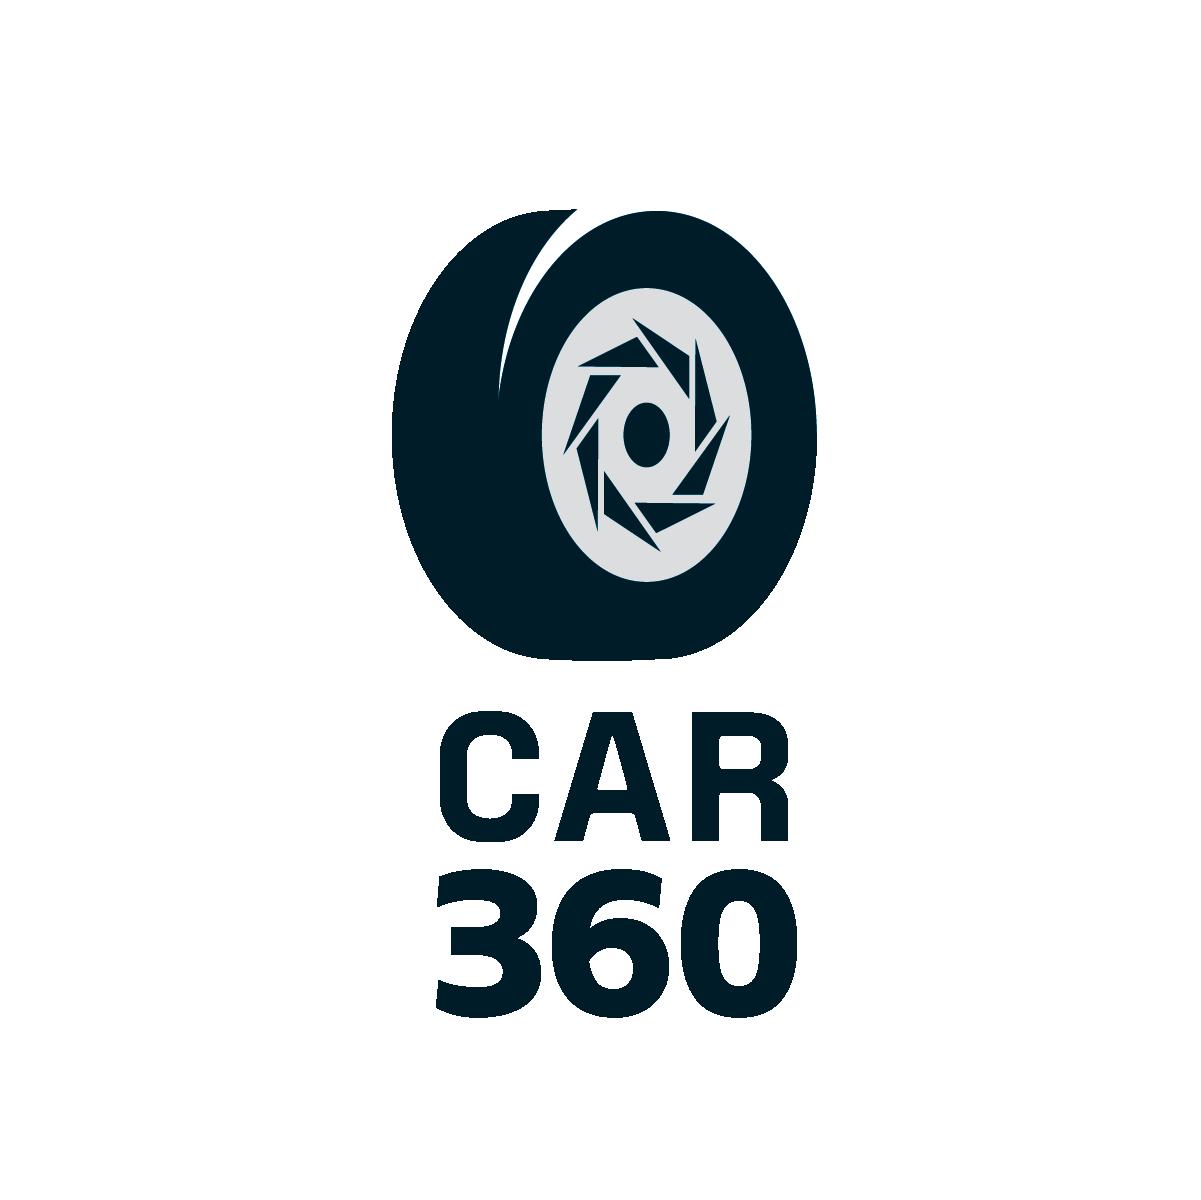 Virtual car camera tech company